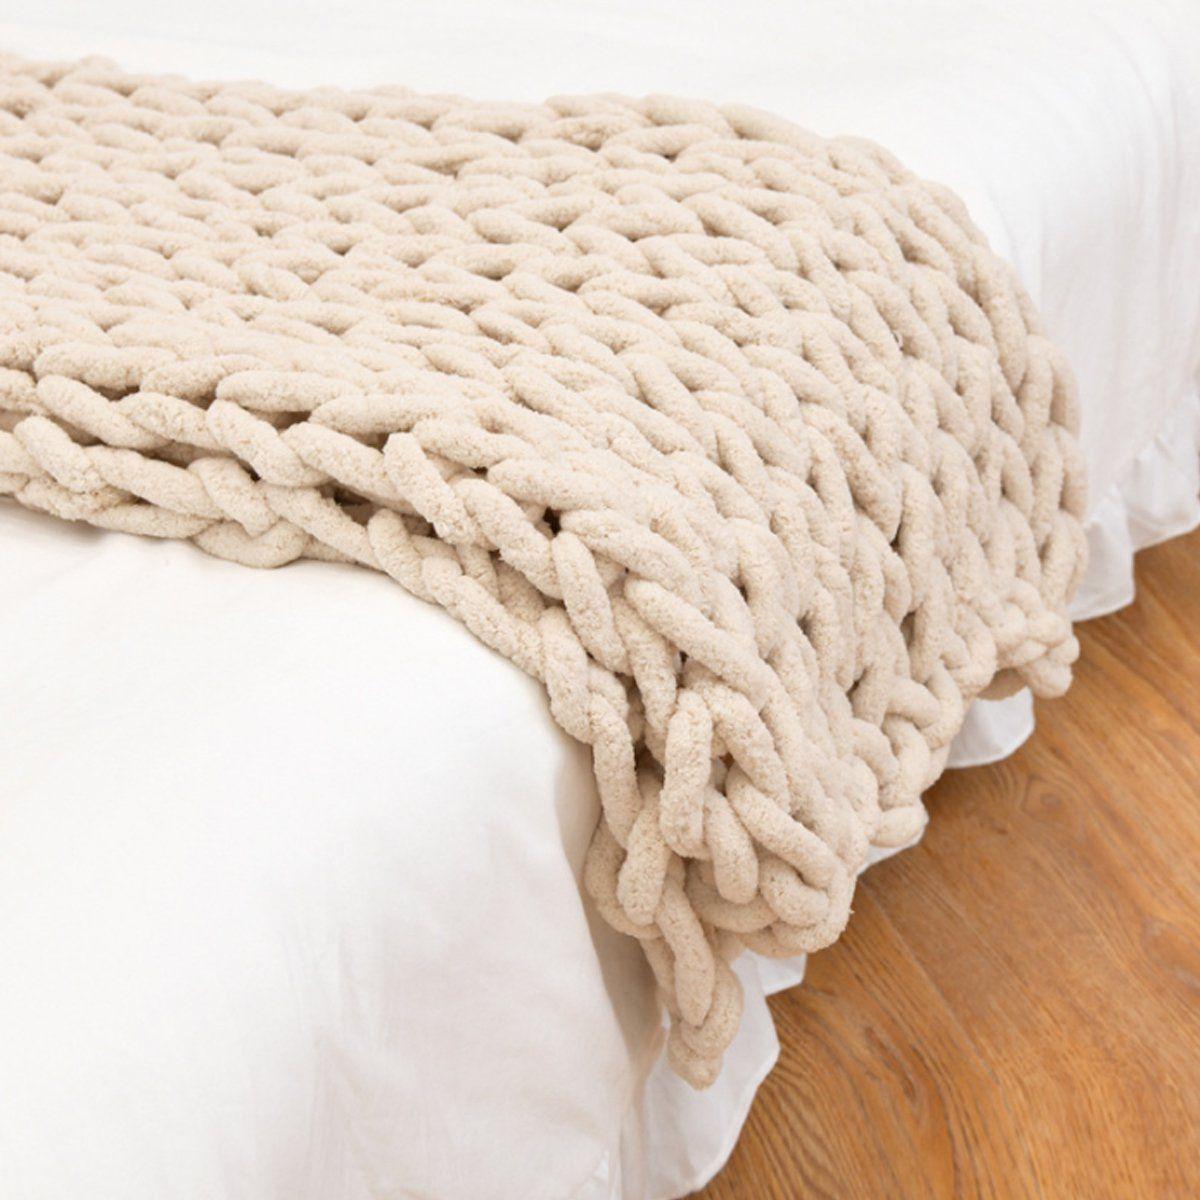 Washable Handwoven Bulky Skinfriendly Blanket Warm Soft